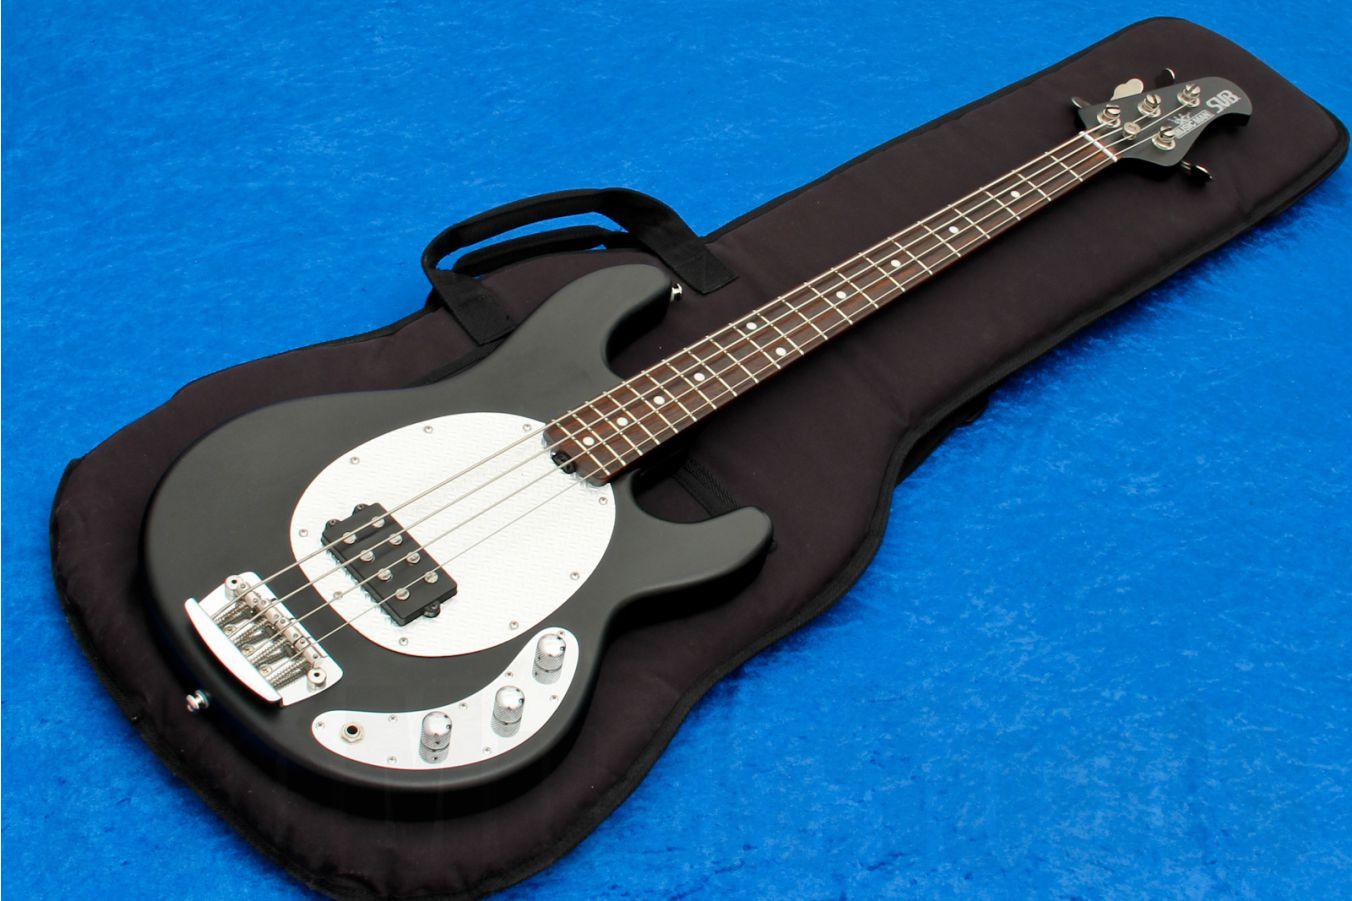 Music Man USA Stingray S.U.B. 4 Active T1 - Textured Black